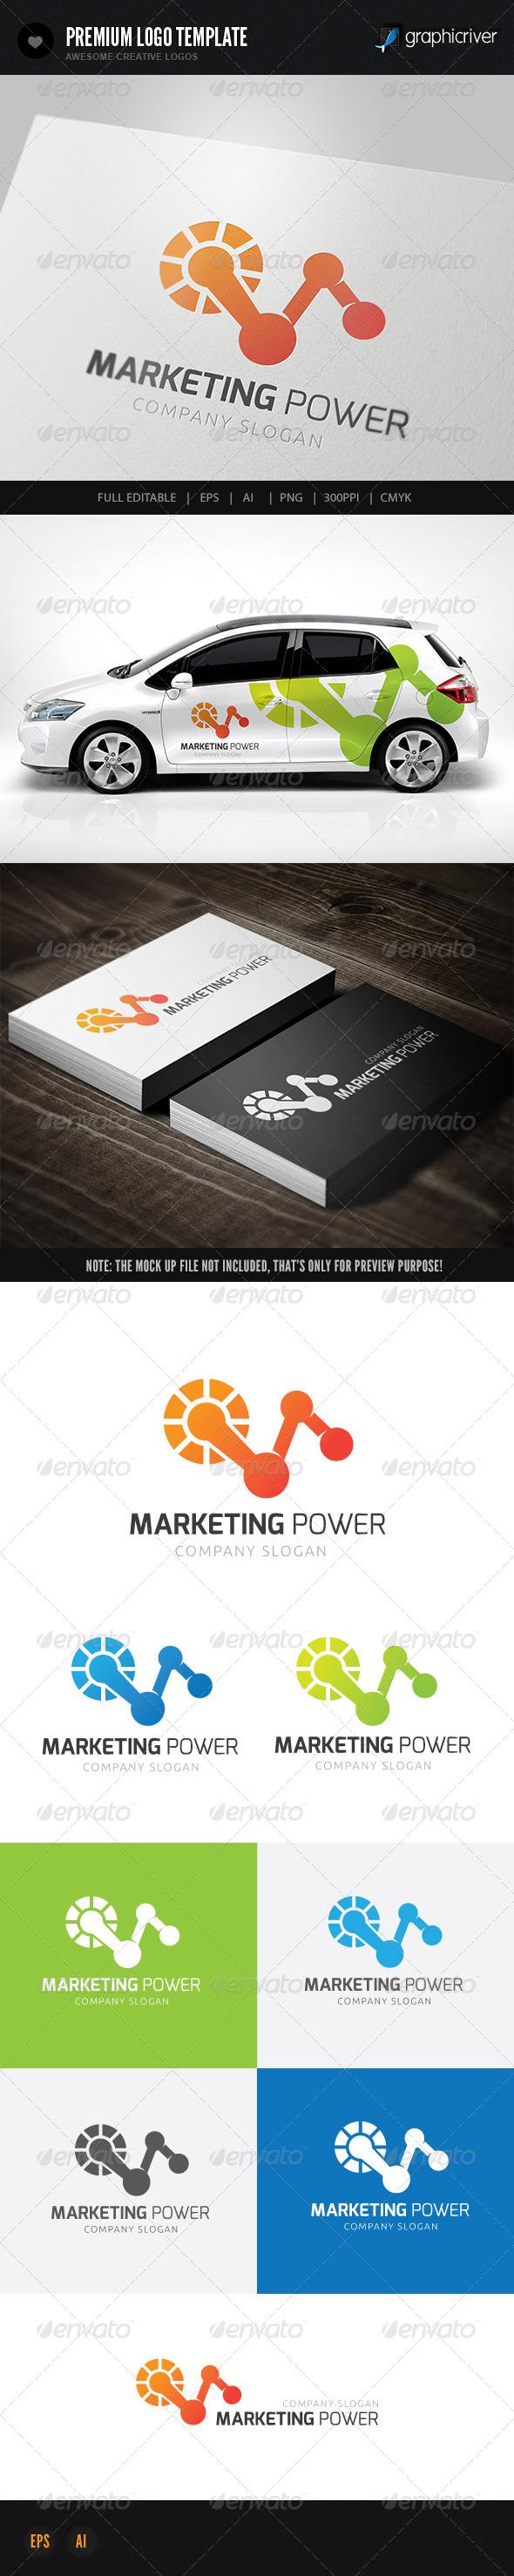 Marketing Power